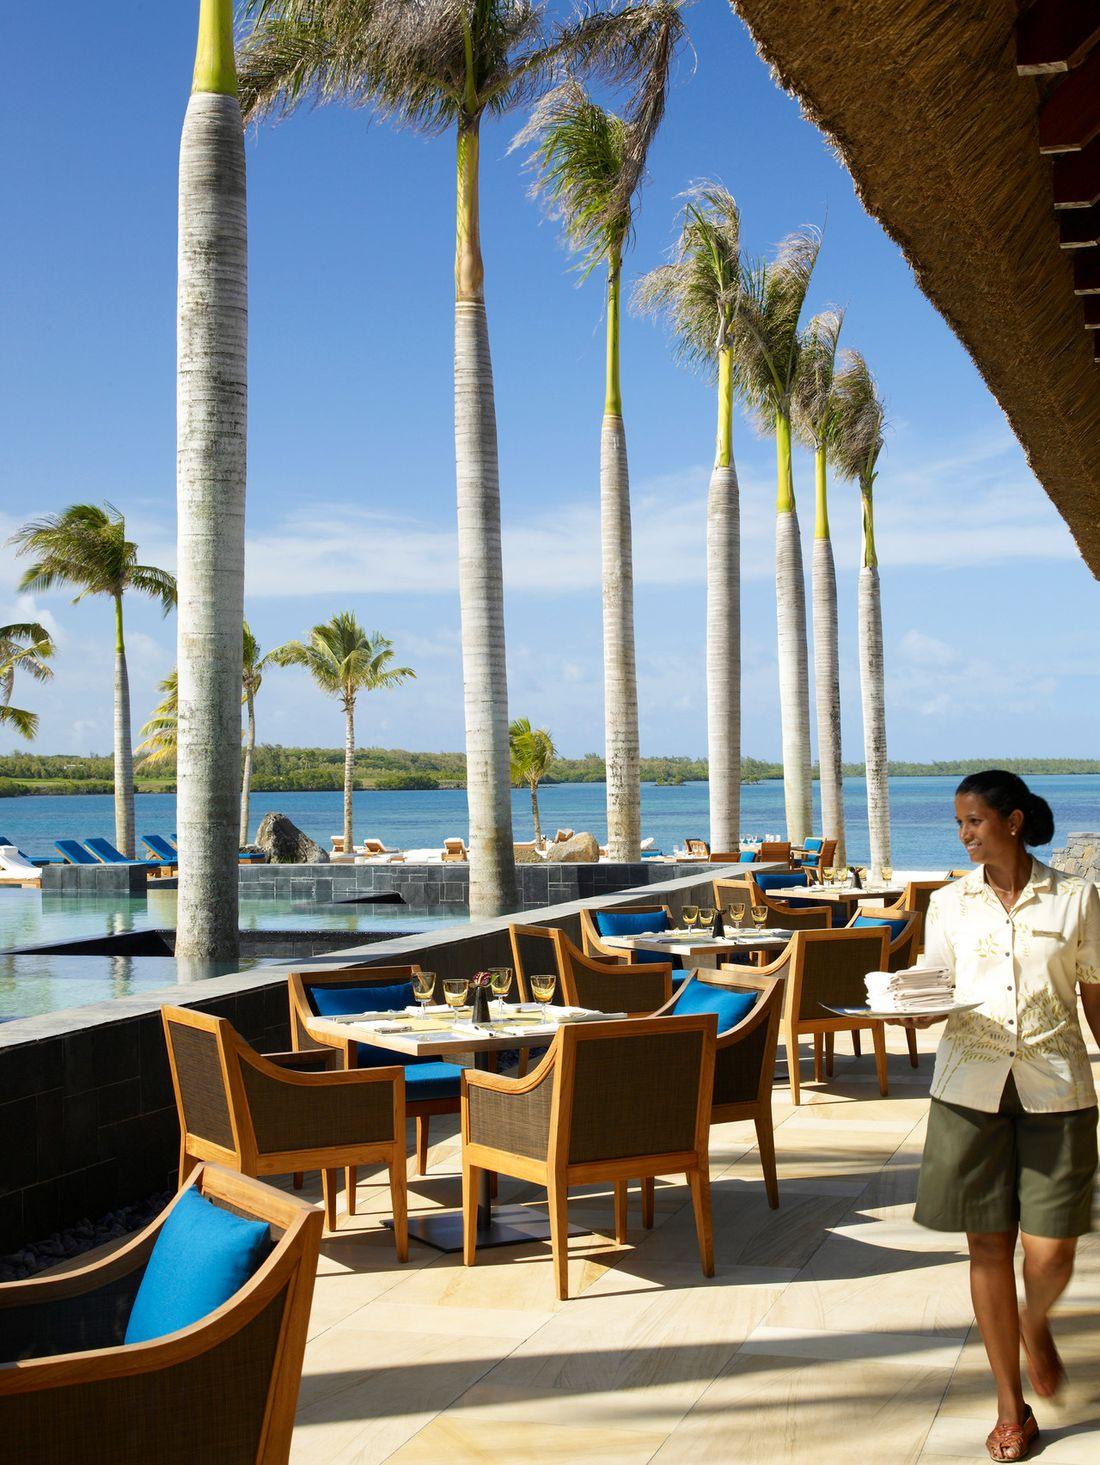 four-seasons-resort-mauritius (4)